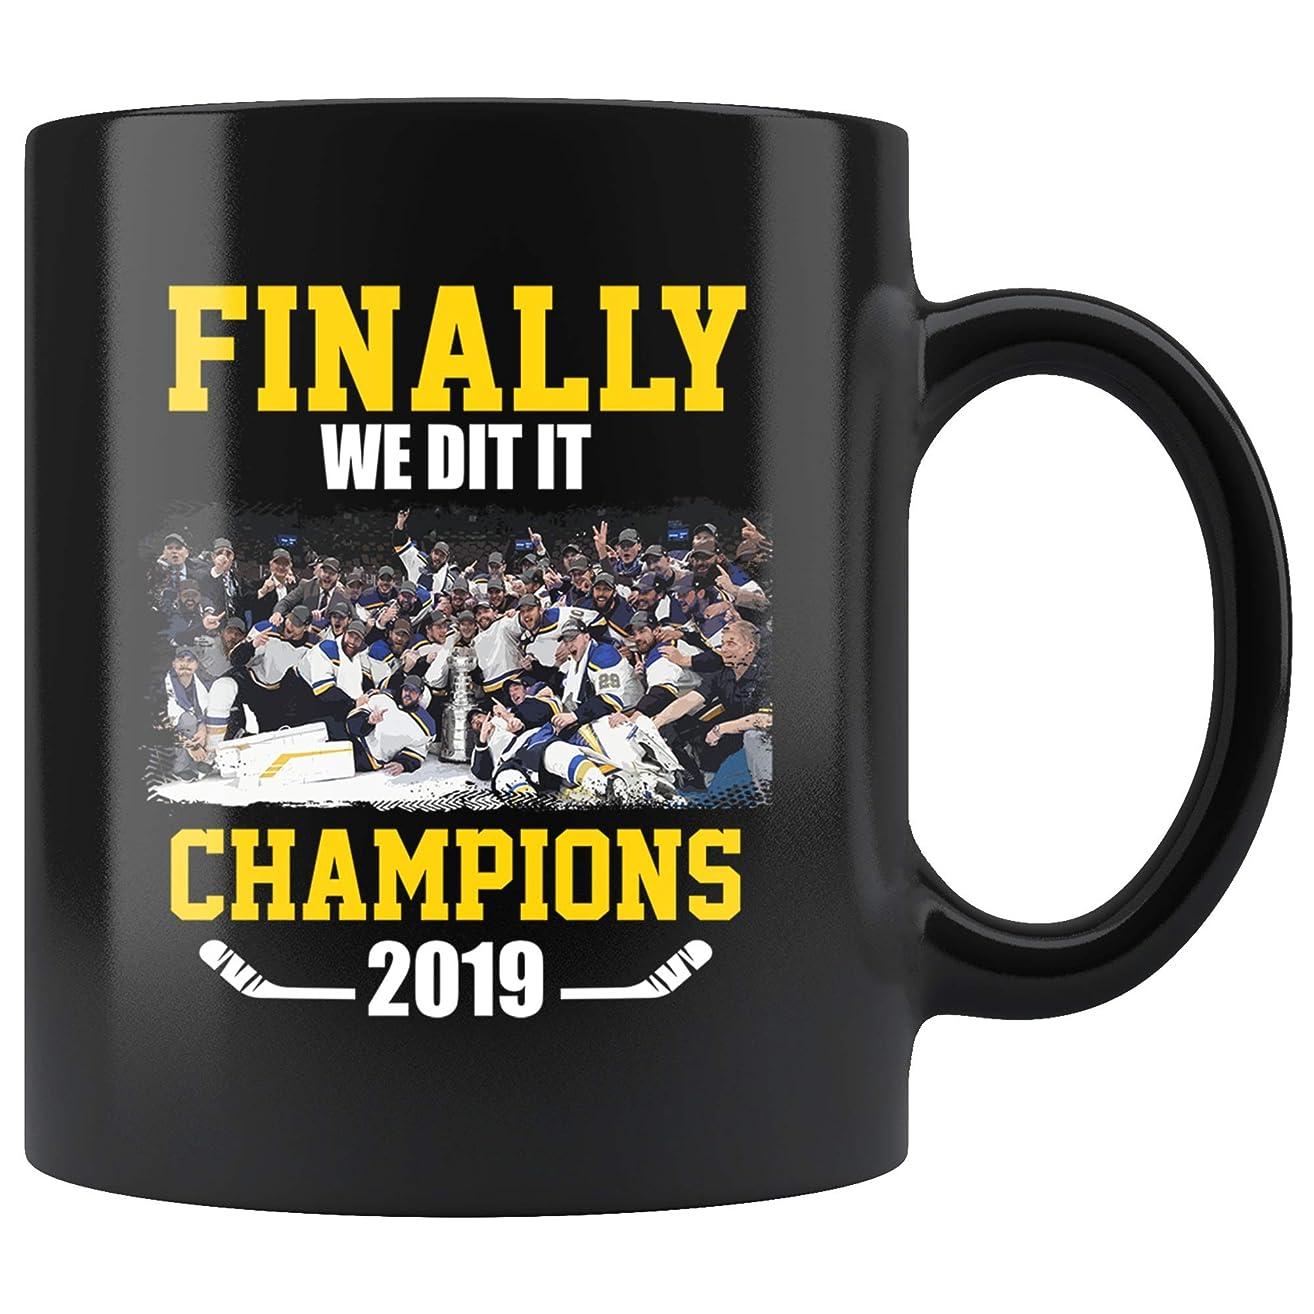 Finally We Did It Champions 2019 St. Louis Jersey Hockey Big Gift Fan Customized Handmade 11oz Black Mug